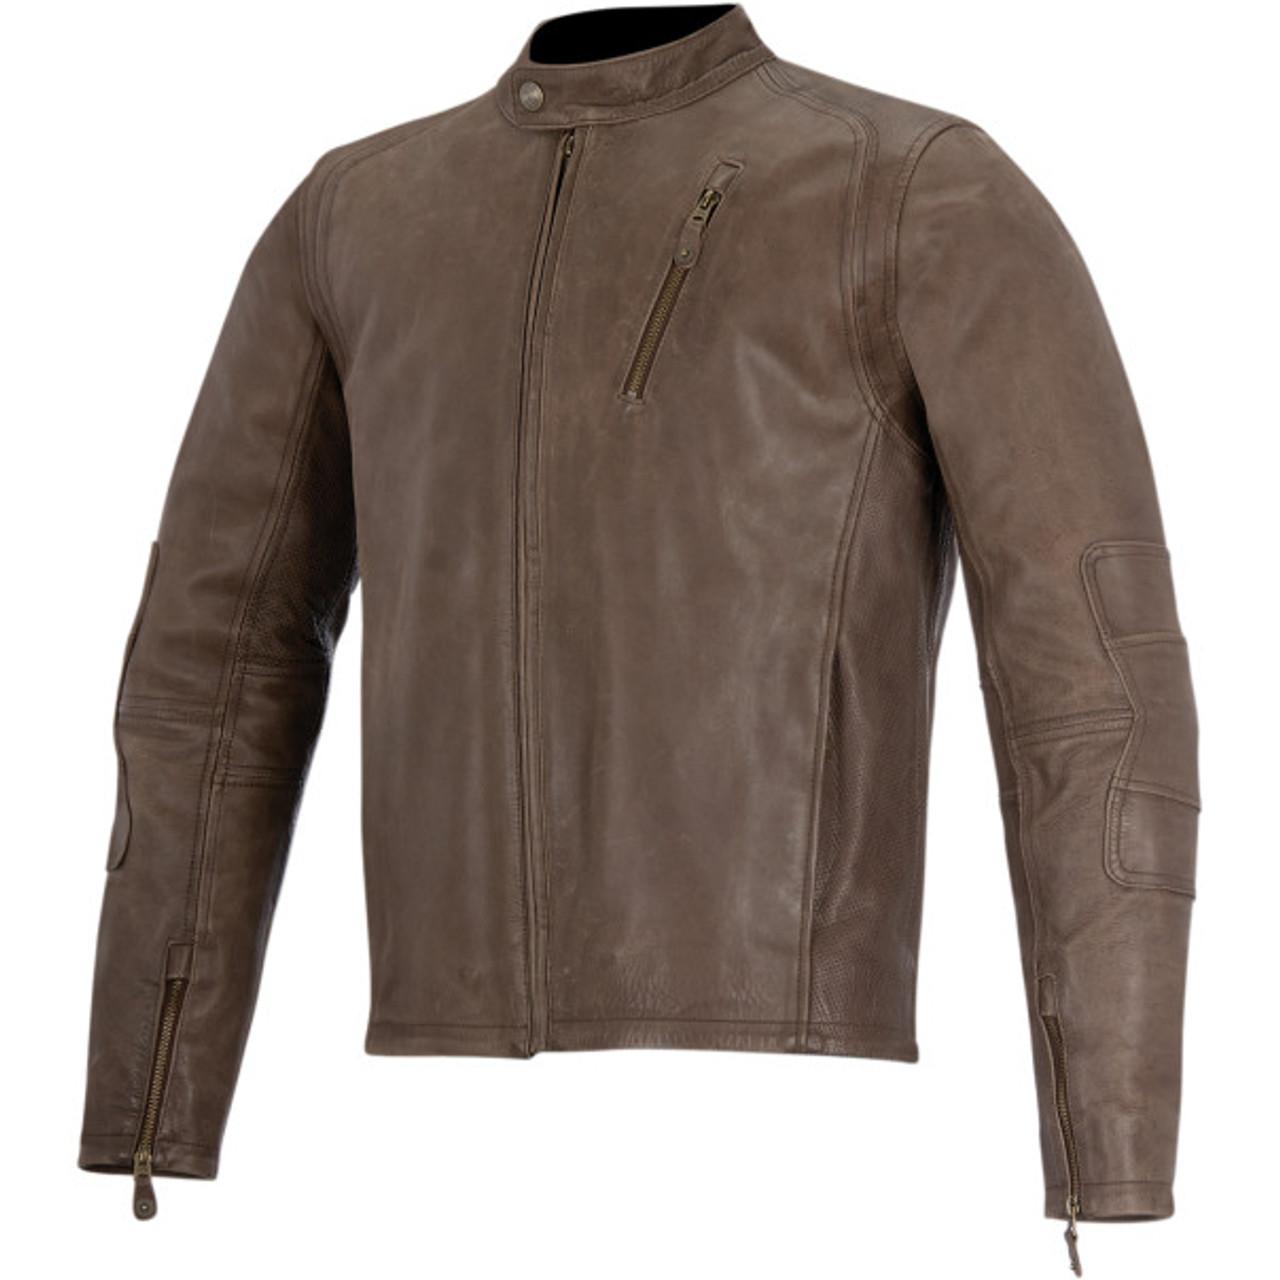 Alpinestars Leather Jacket >> Alpinestars Oscar Monty Leather Motorcycle Jacket Get Lowered Cycles